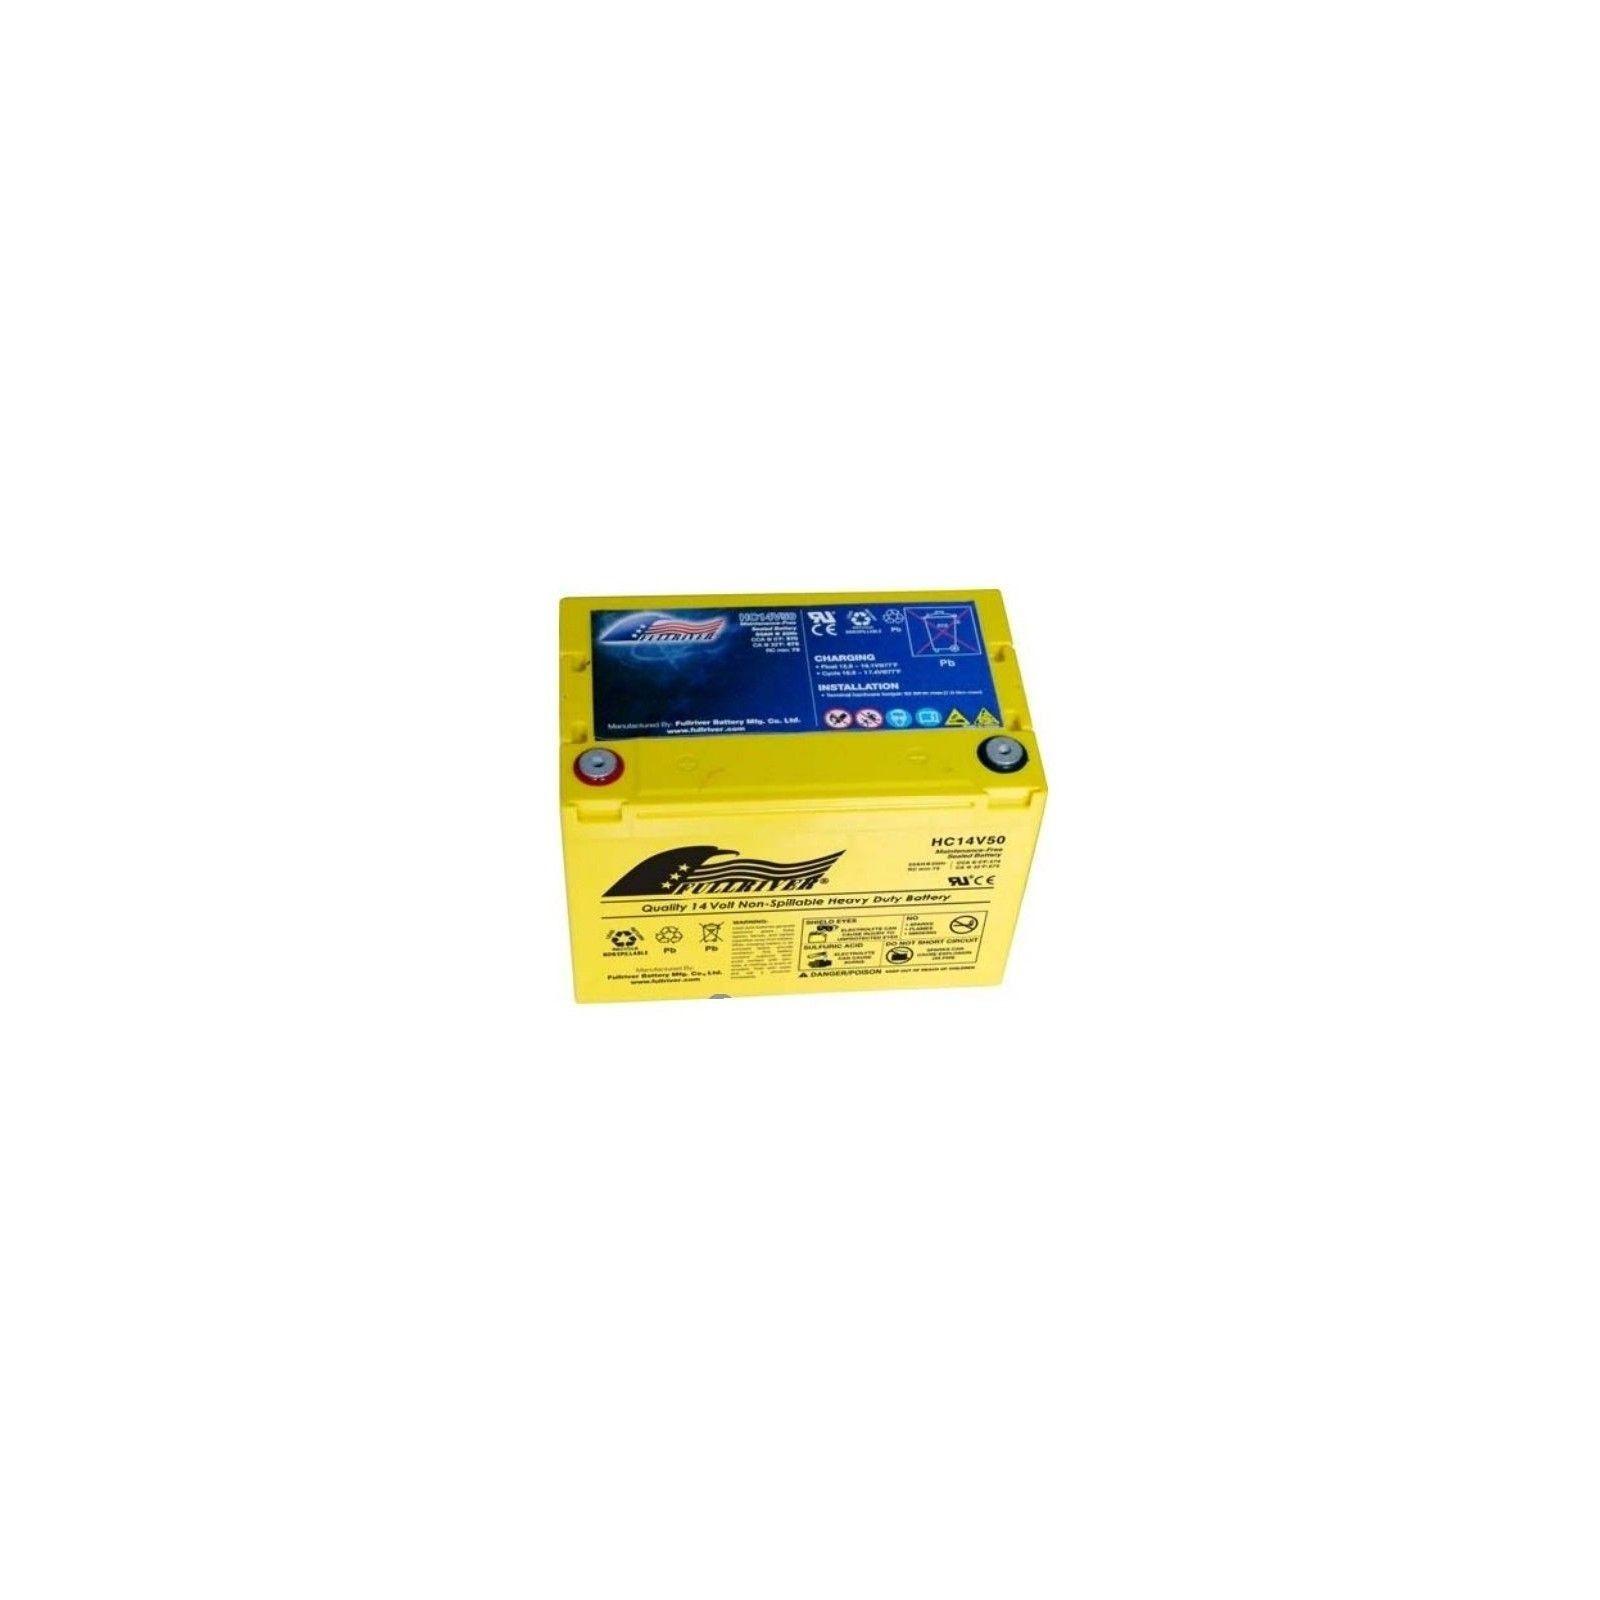 Battery Fullriver HC14V50 50Ah 570A 14V Hc FULLRIVER - 1